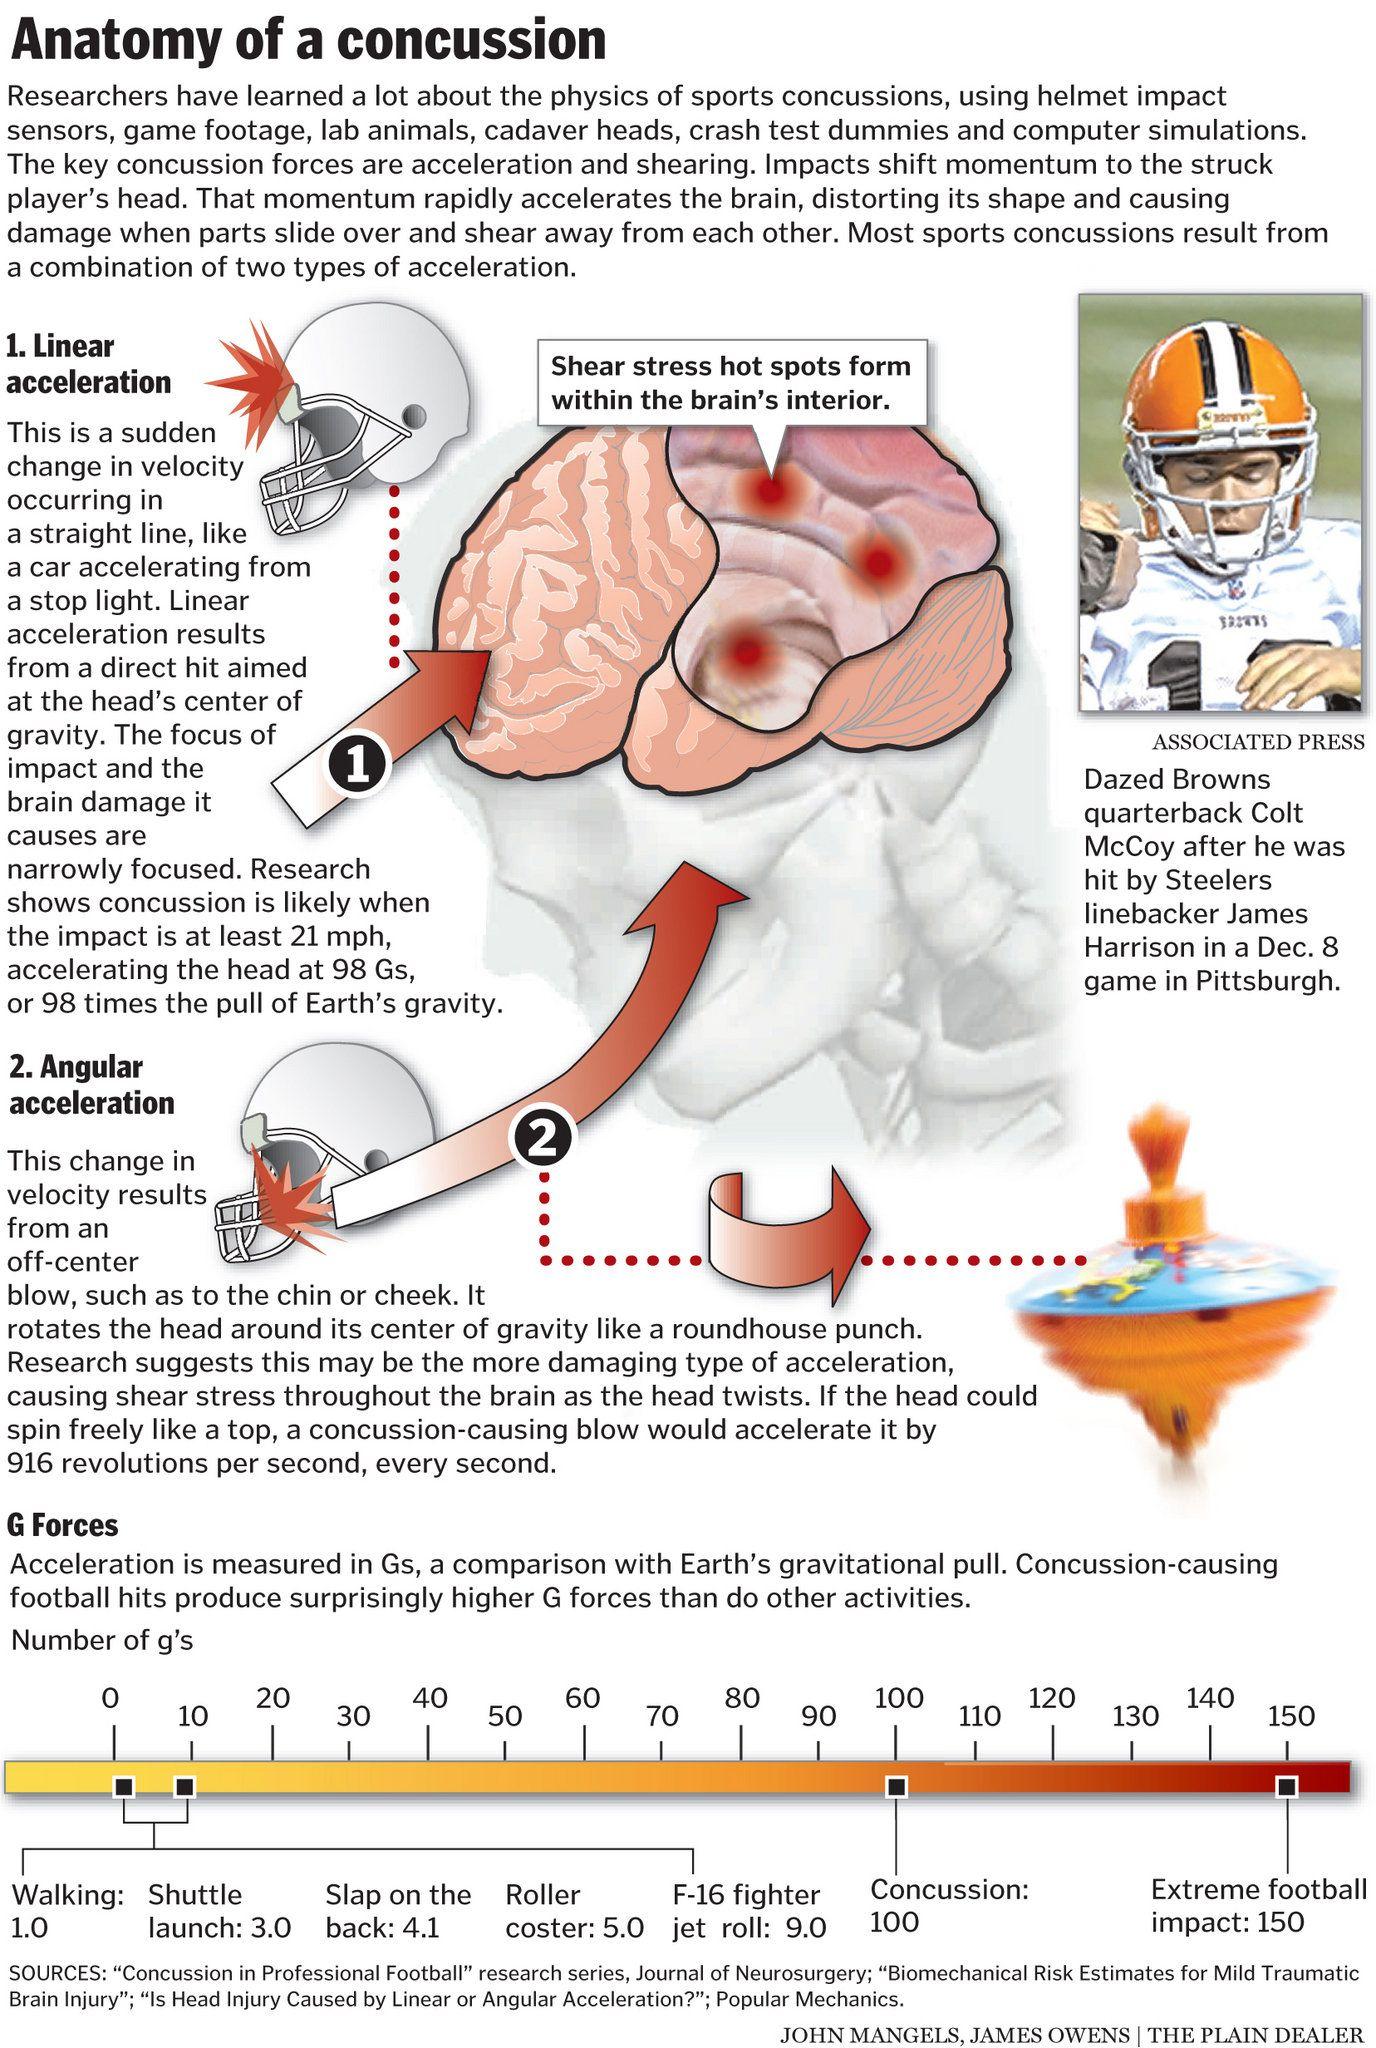 Anatomy of a concussion   medizina   Pinterest   Anatomy, Brain ...